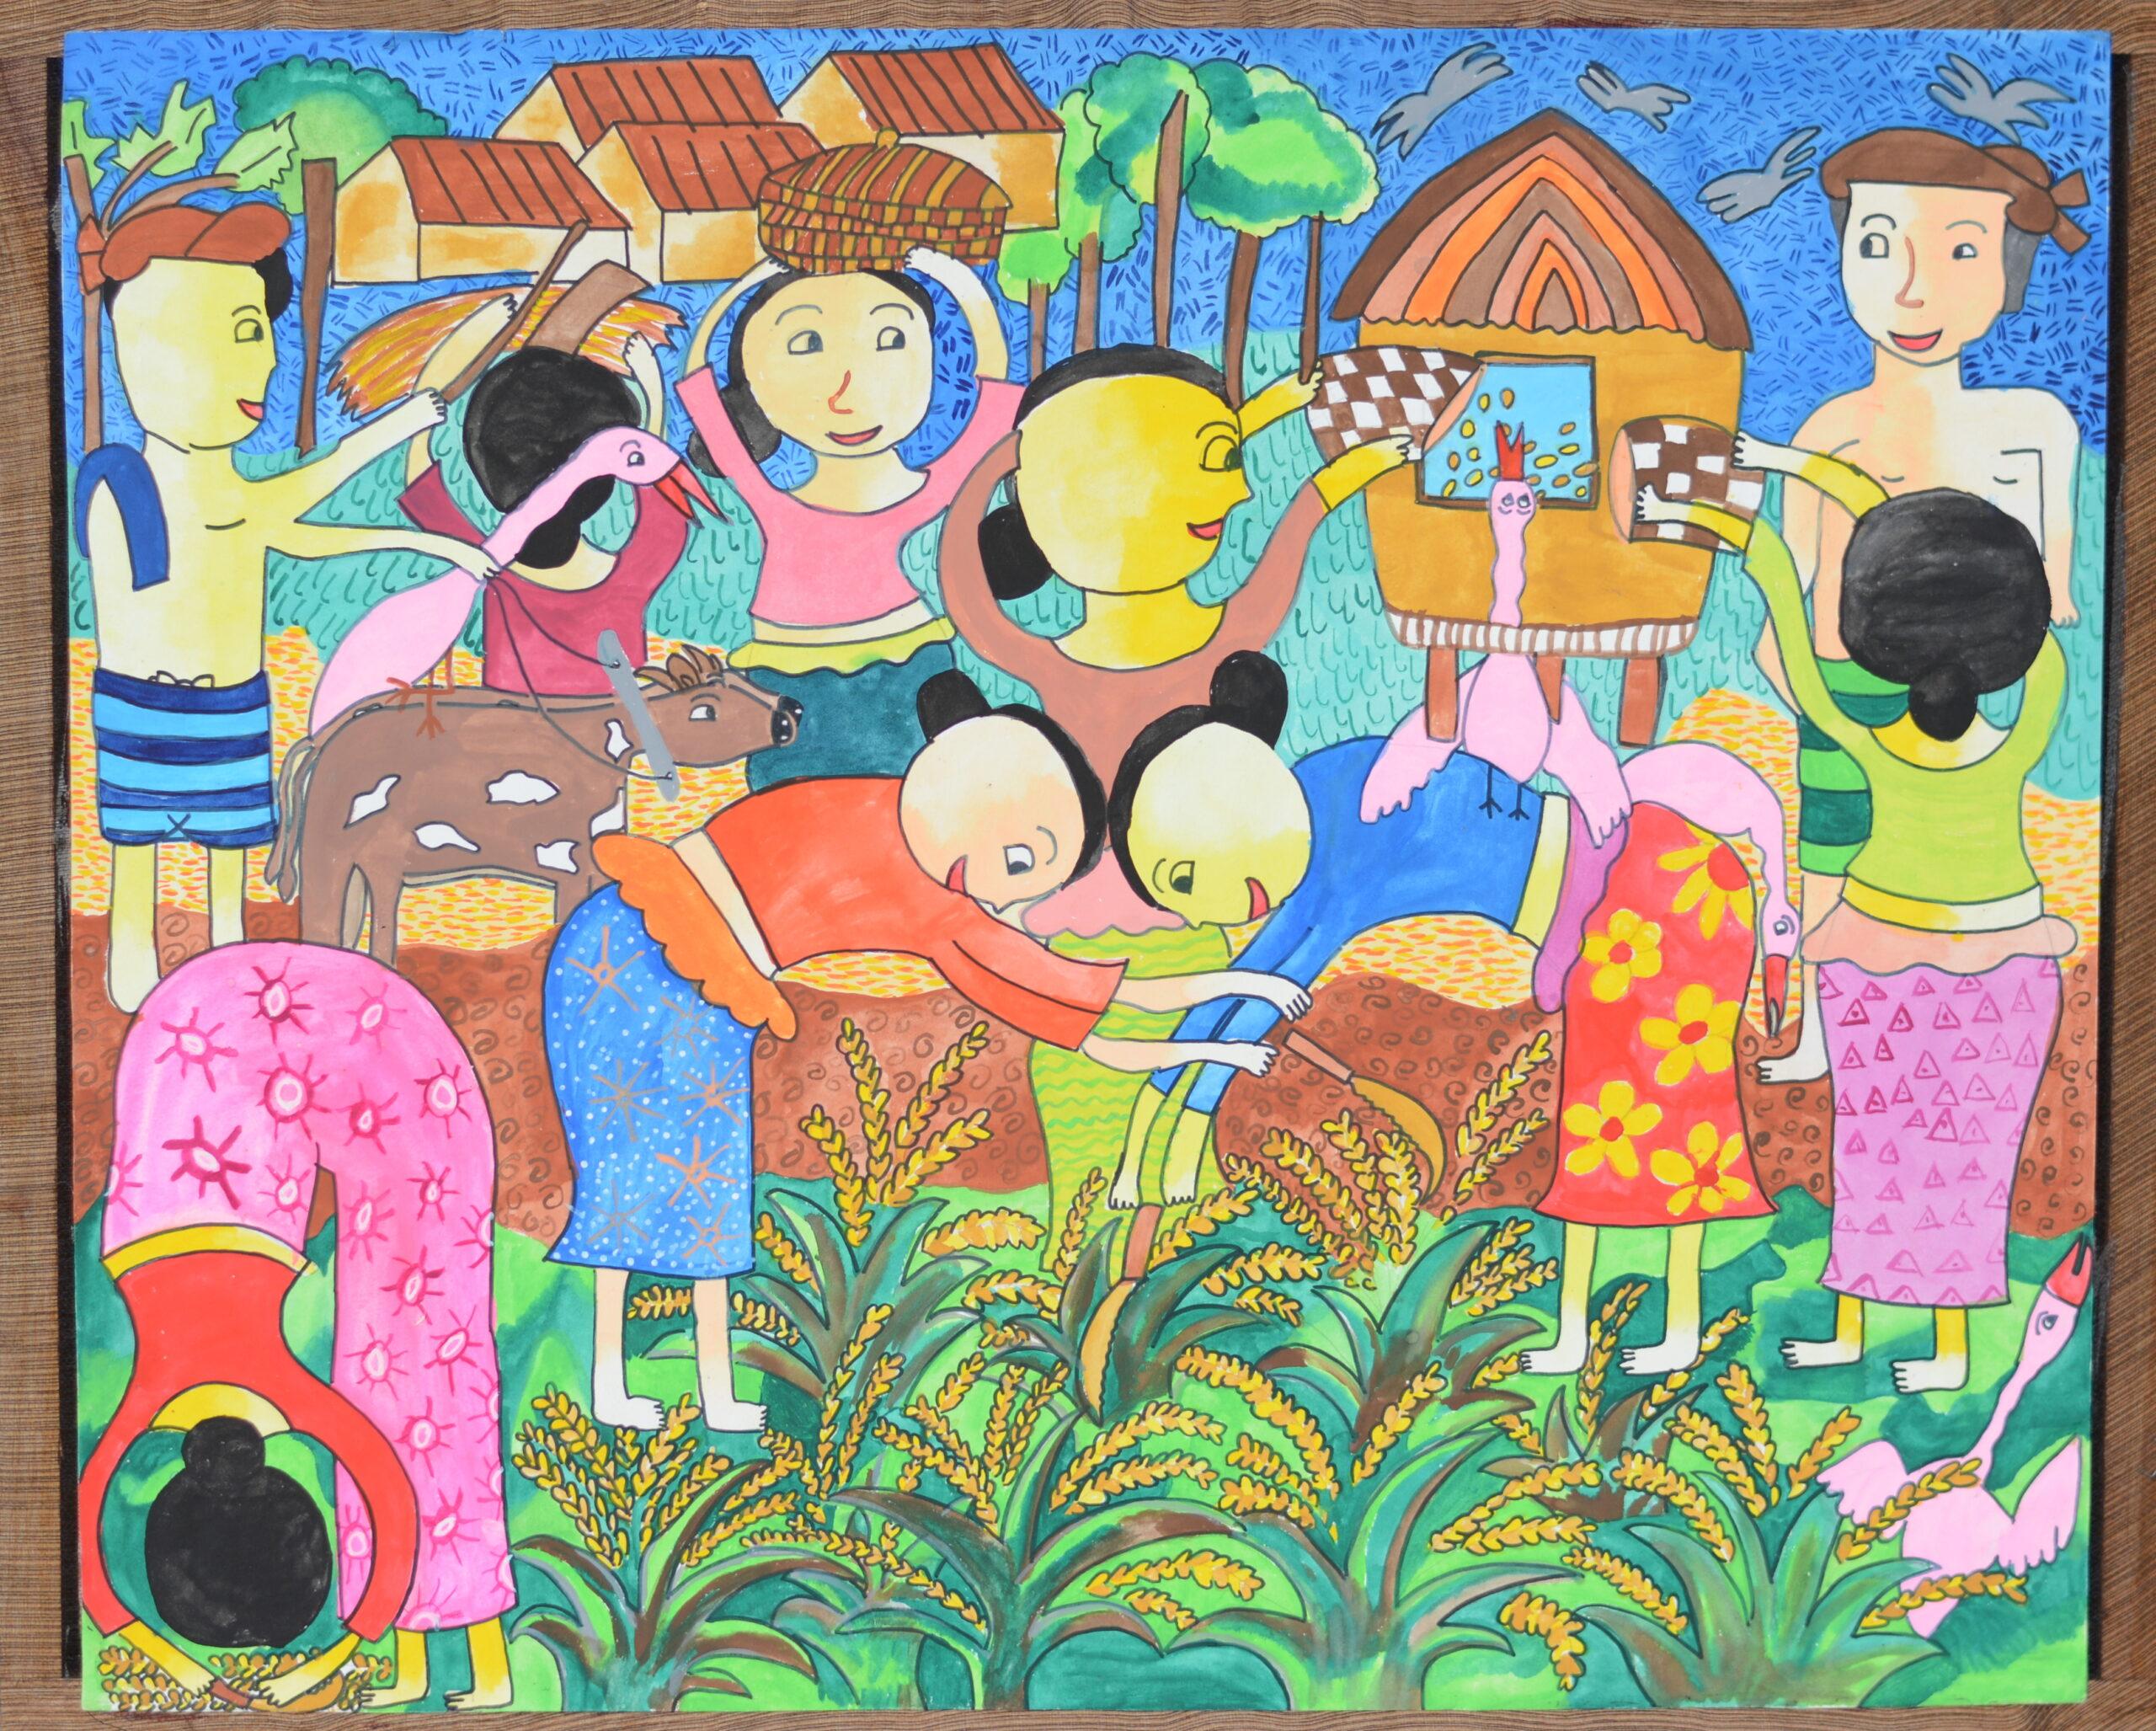 Let us harvest the paddy_A. M. B. Dihansa Thusanmi Rathnayake